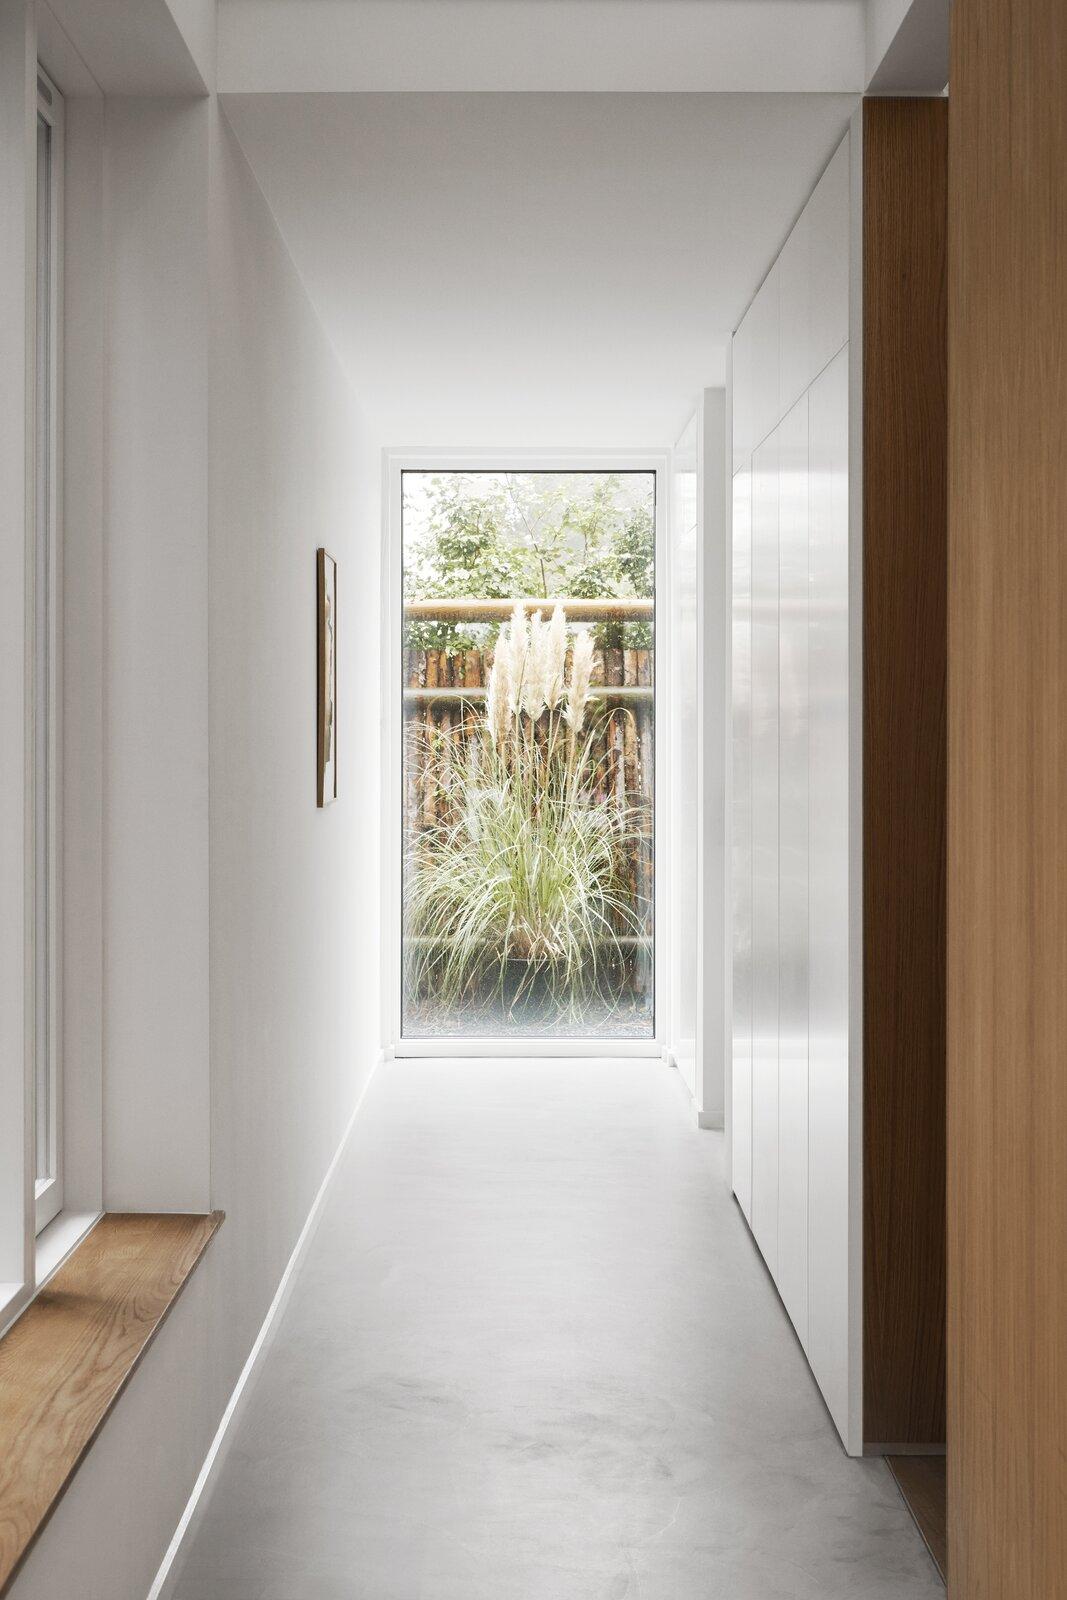 Villa Bülowsvej by EFFEKT hallway with floor-to-ceiling window